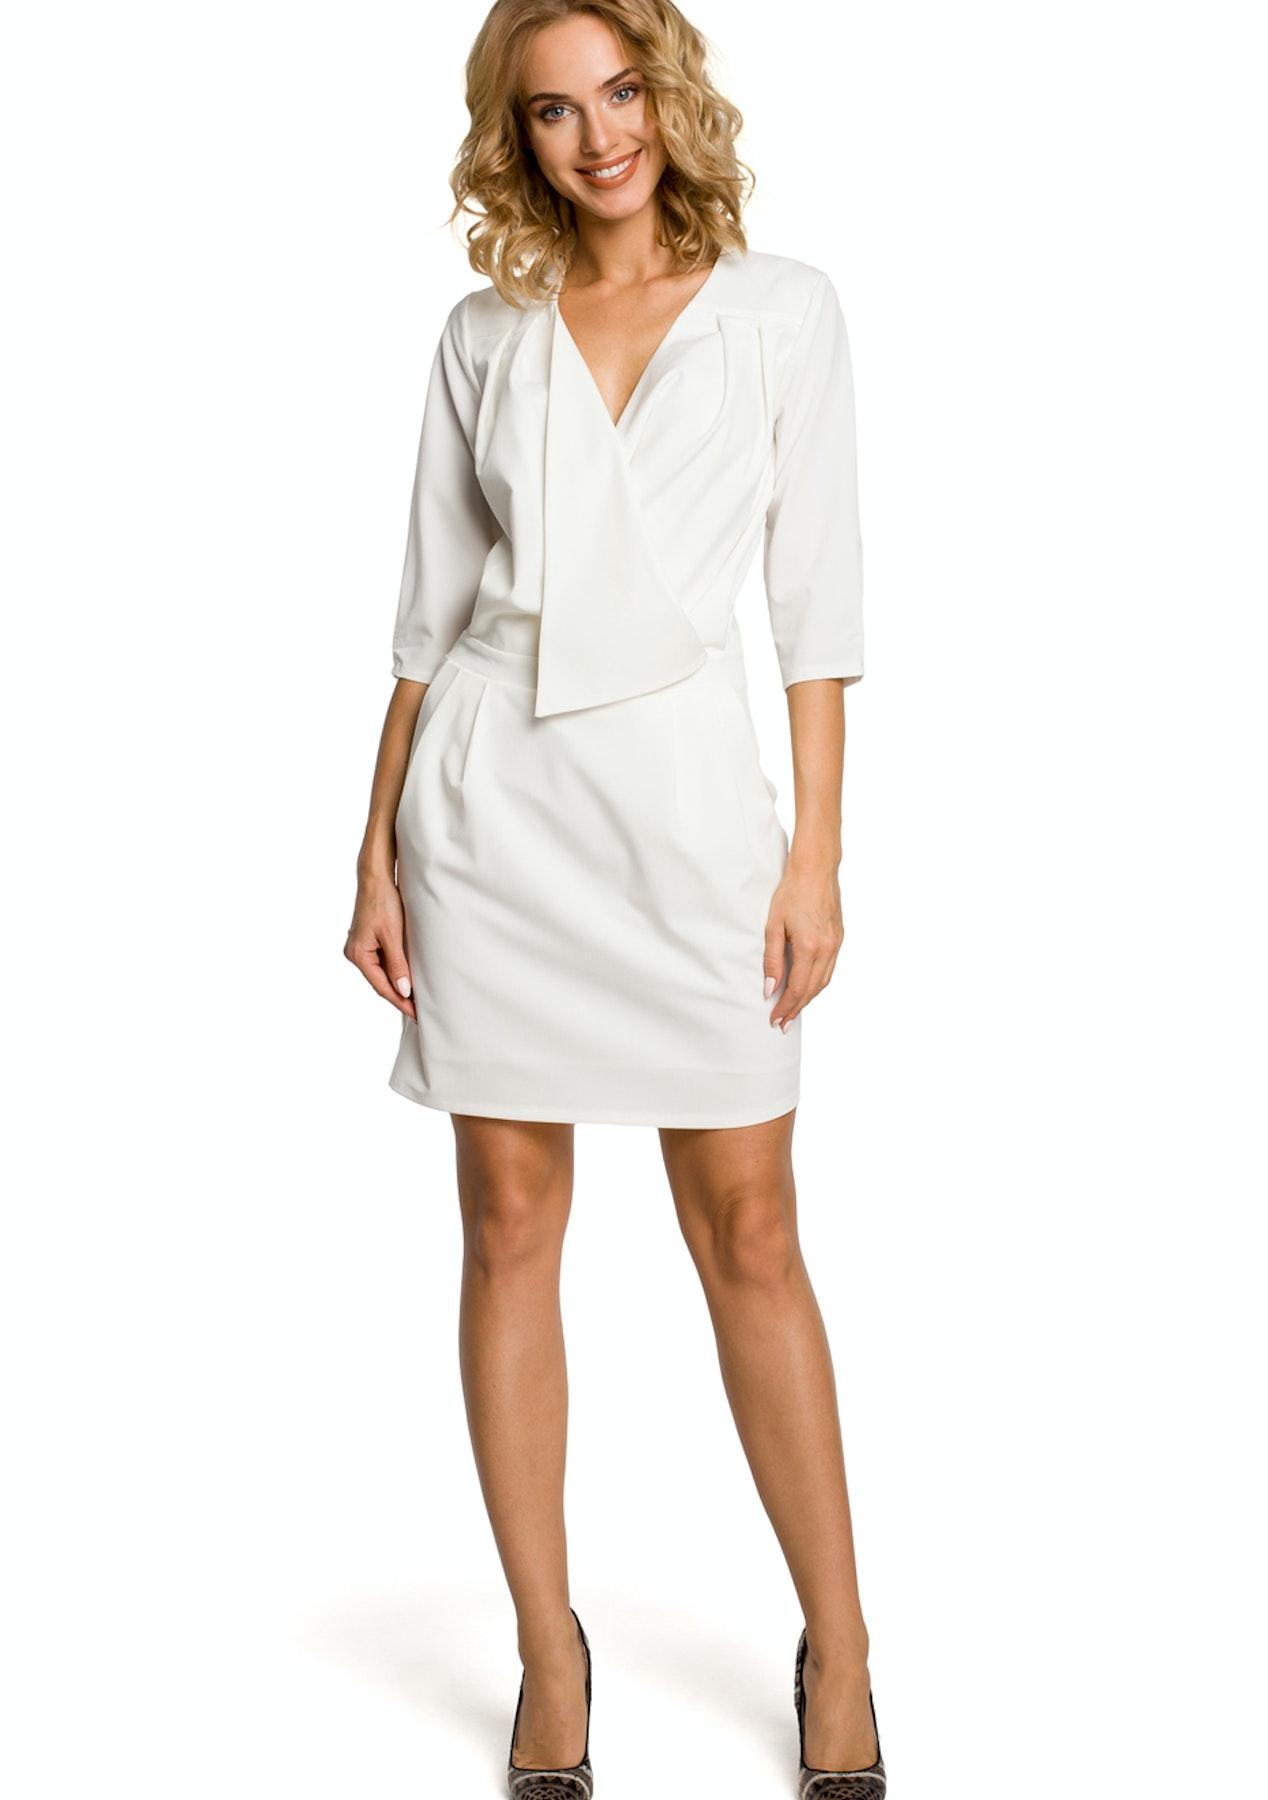 7dc1ecedd9 Made of Emotion - Woven Dress - Ecru - Winter Wardrobe Refresh - Onceit